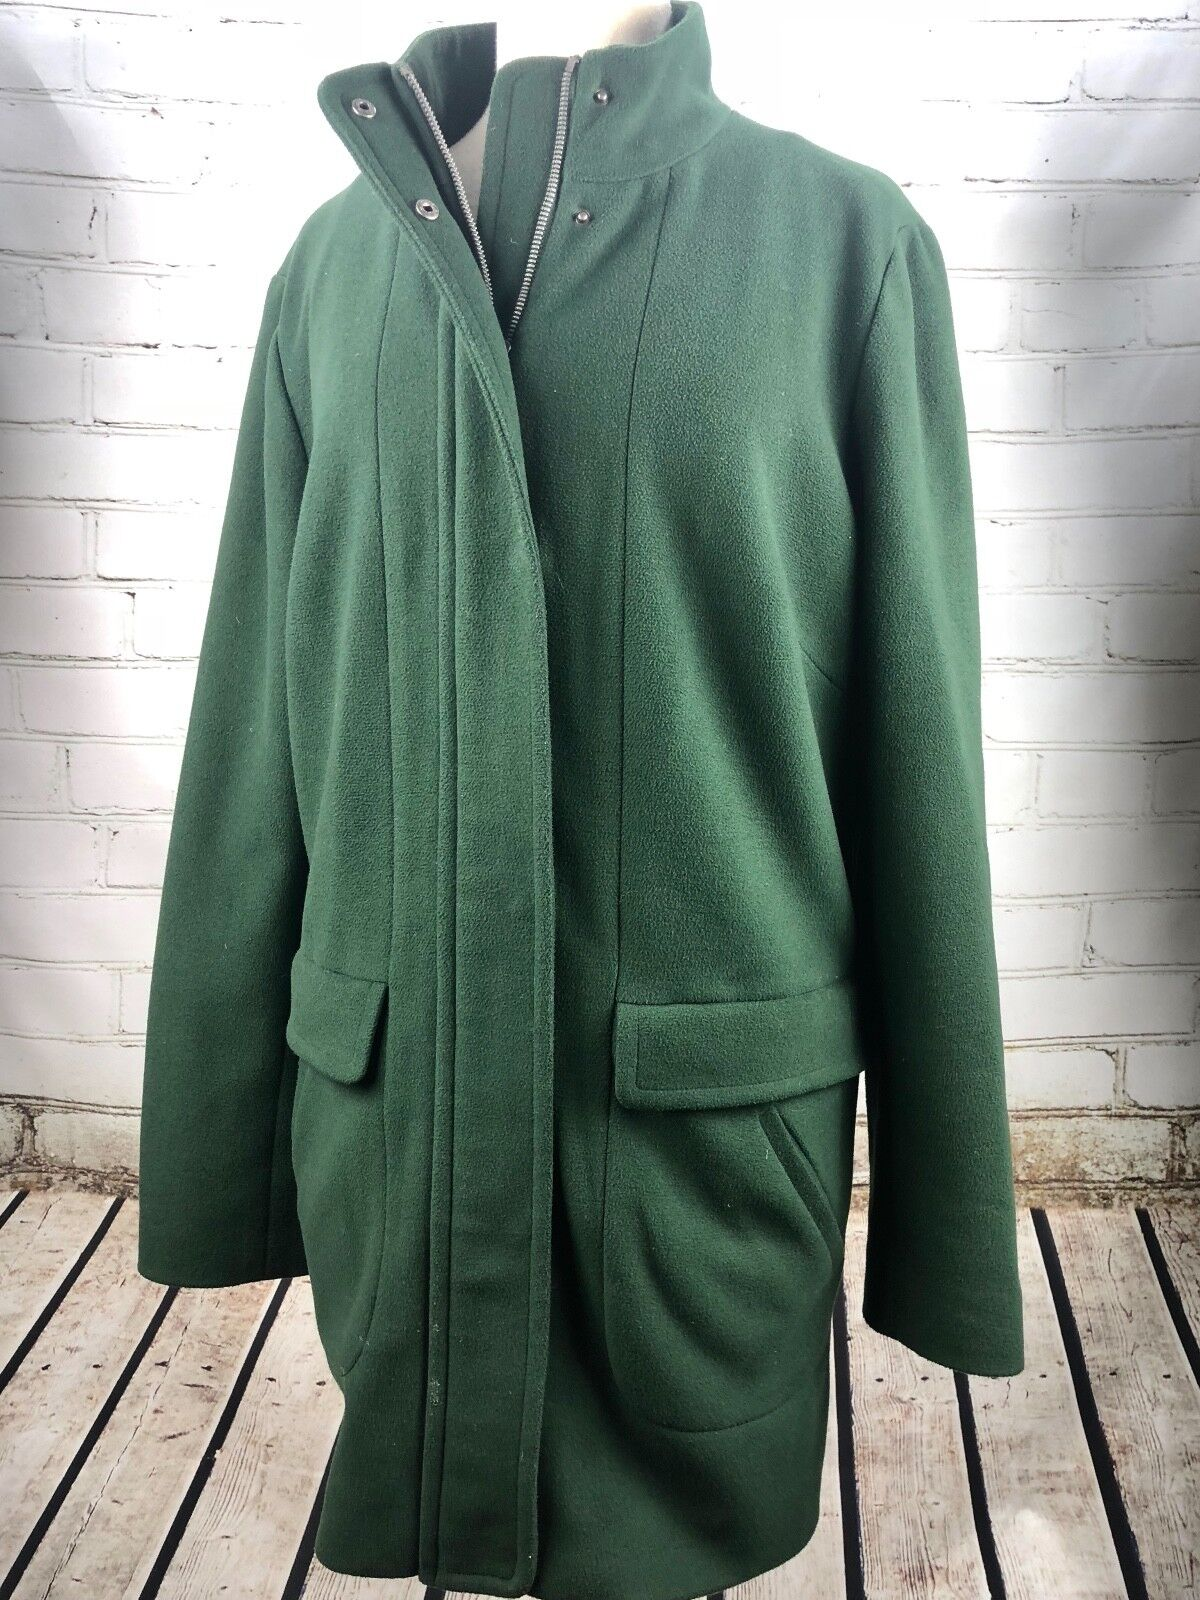 J Jill Fall Winter Coat - Fleece - Long Thigh Length Hunter Green  MSRP Sz L